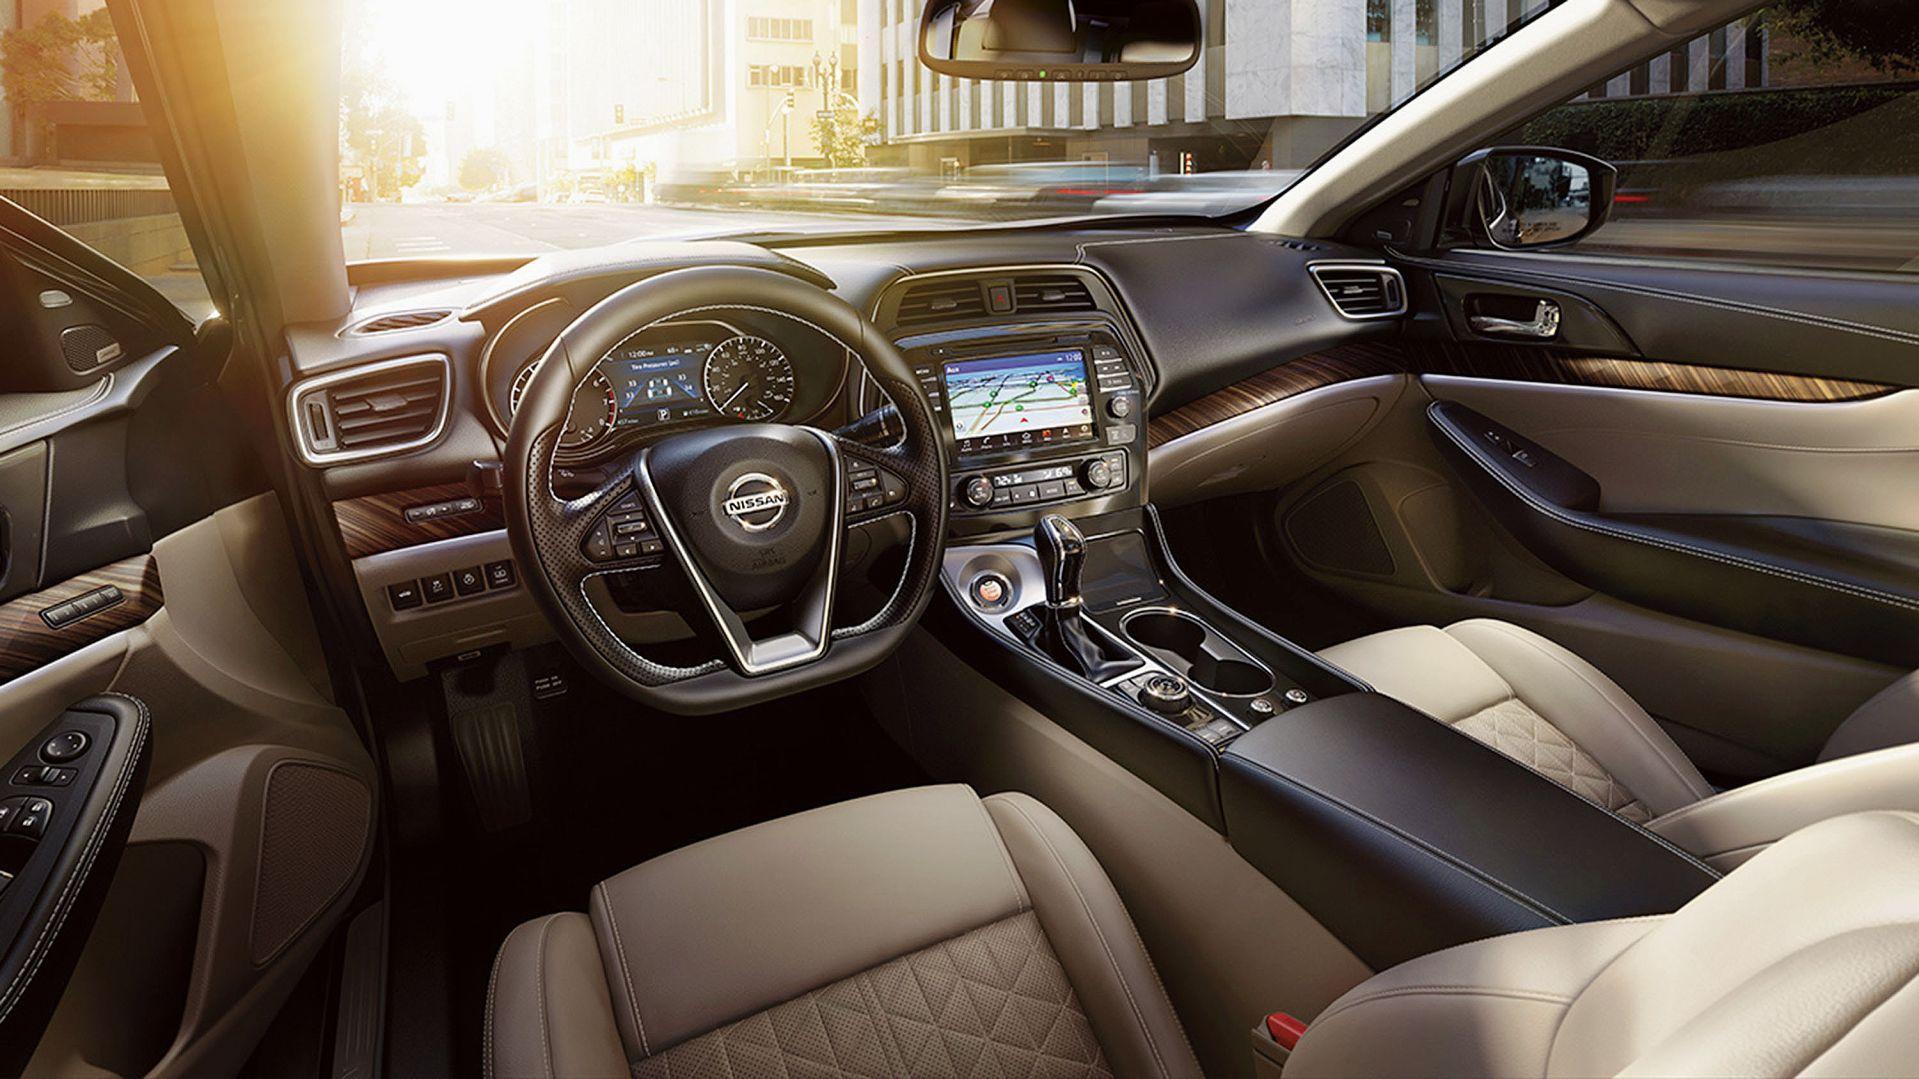 Nissan Maxima 4 Door Sports Car Gets Some Upgrades Autos Newspressnow Com